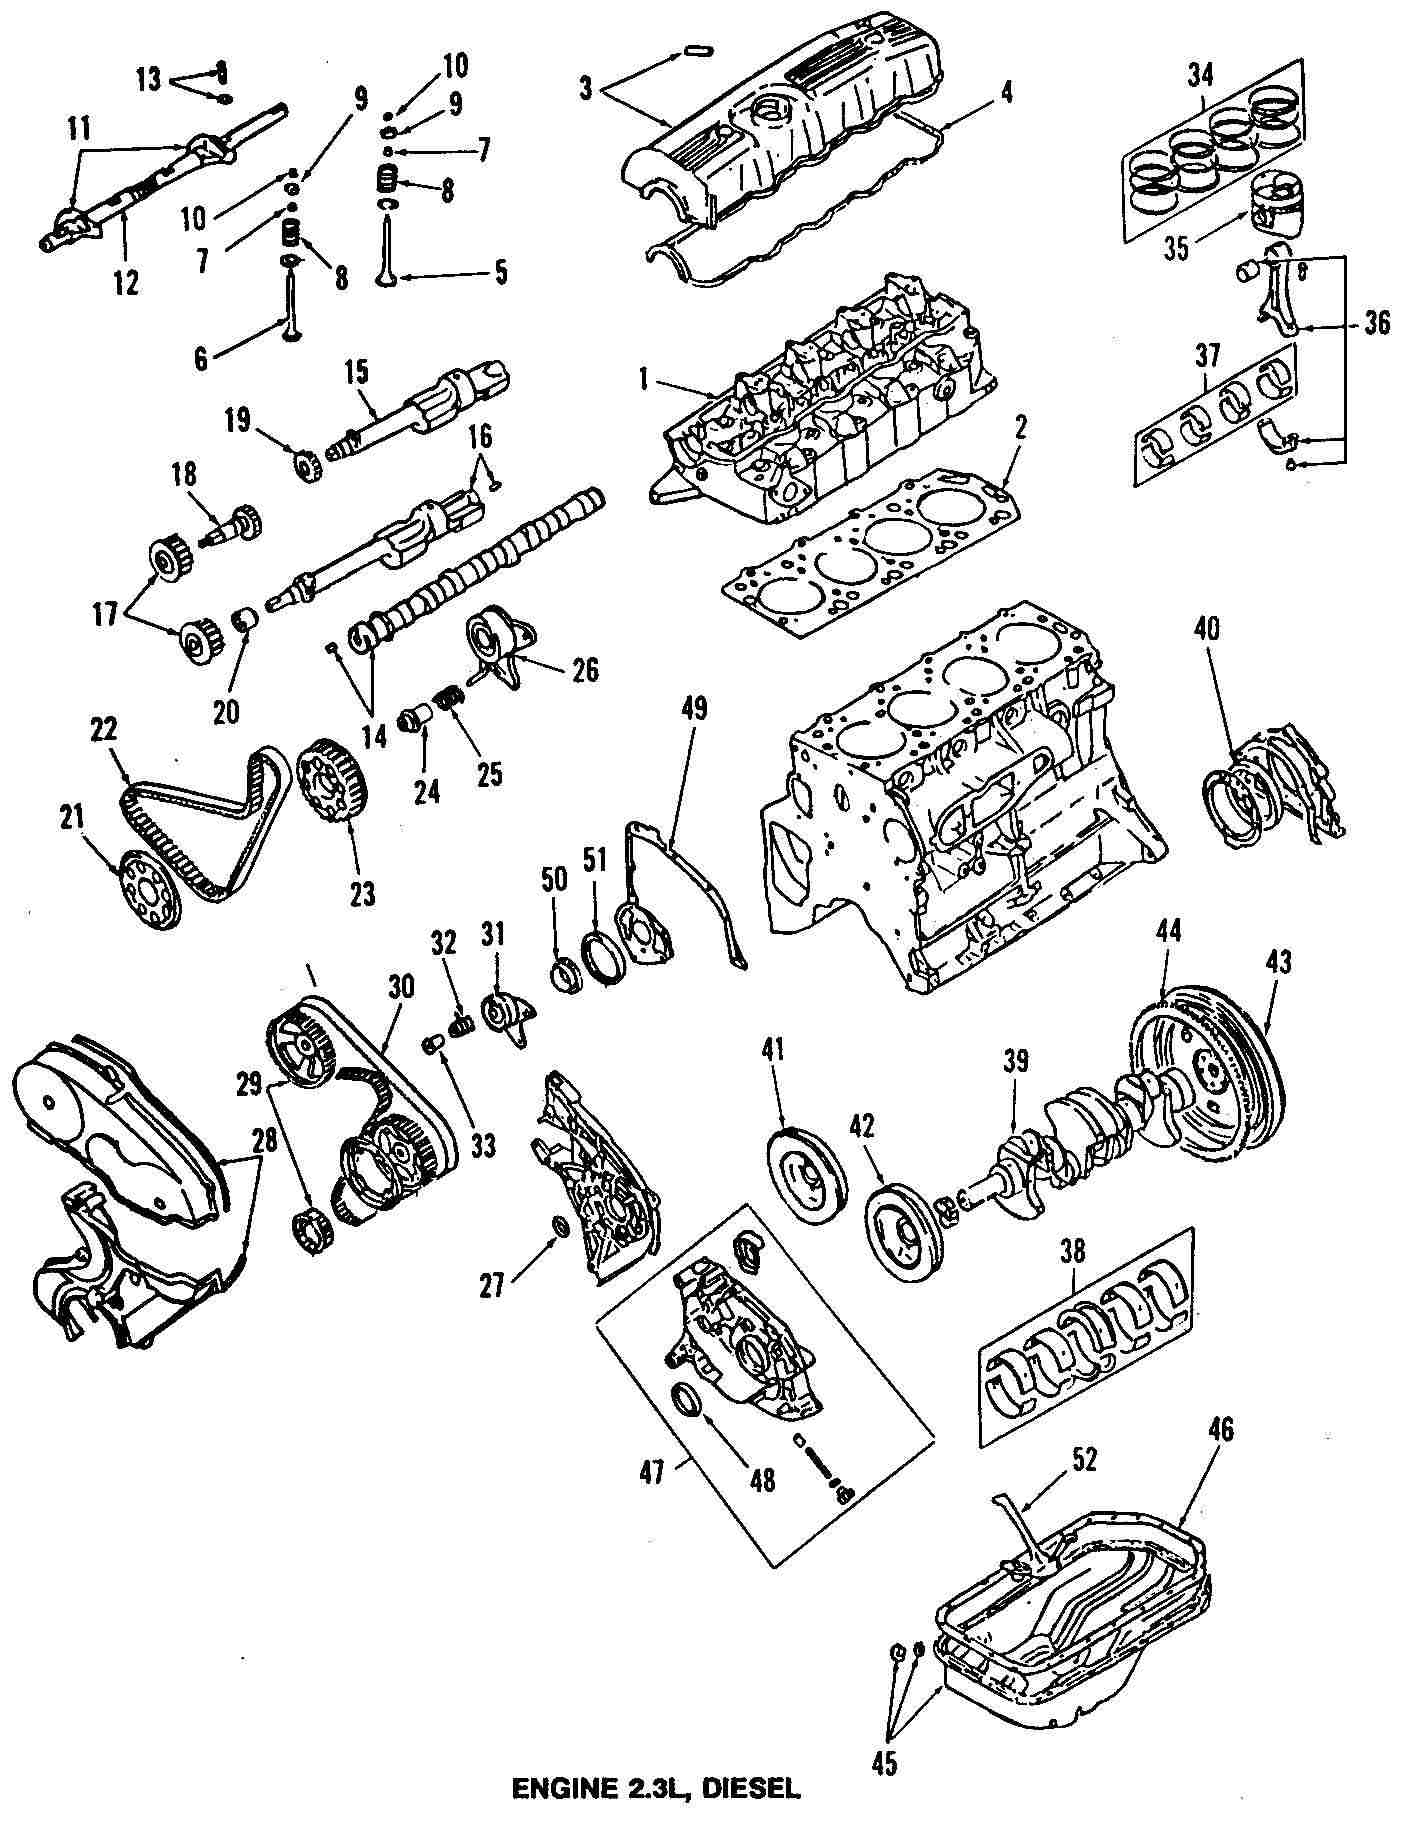 Genuine dodge gear dod md050179